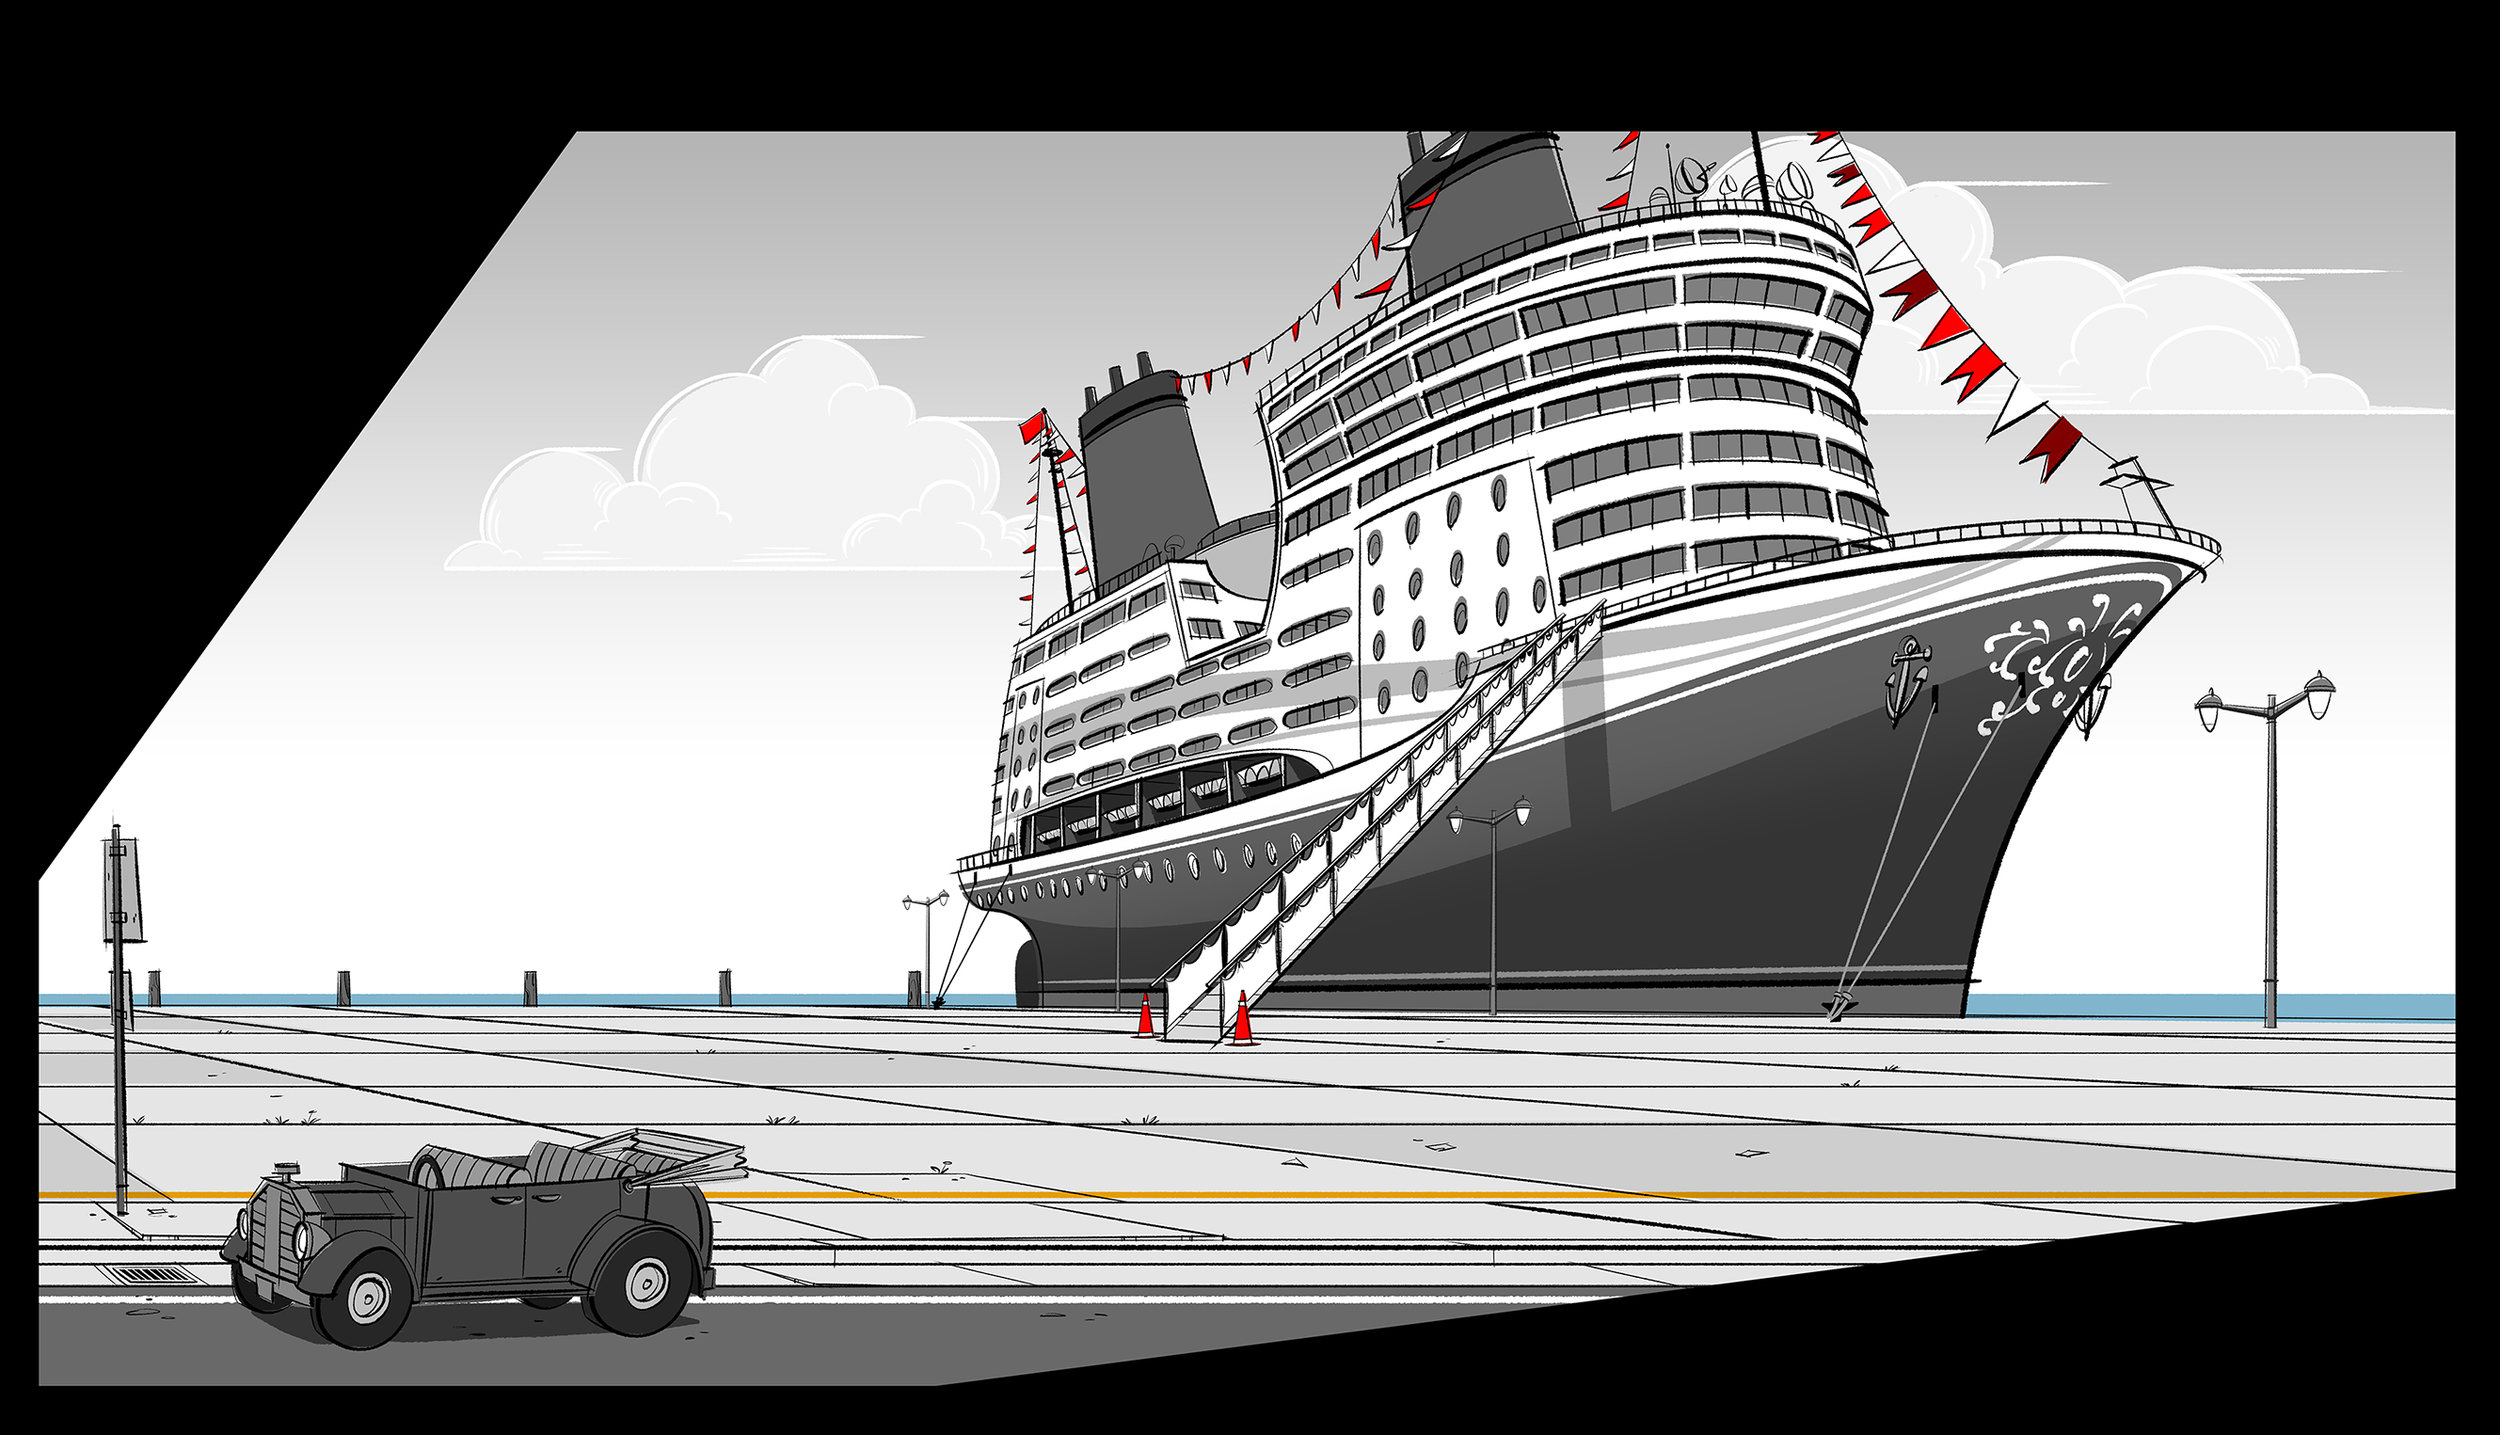 mickey_Boat_Dock_Pan.jpg